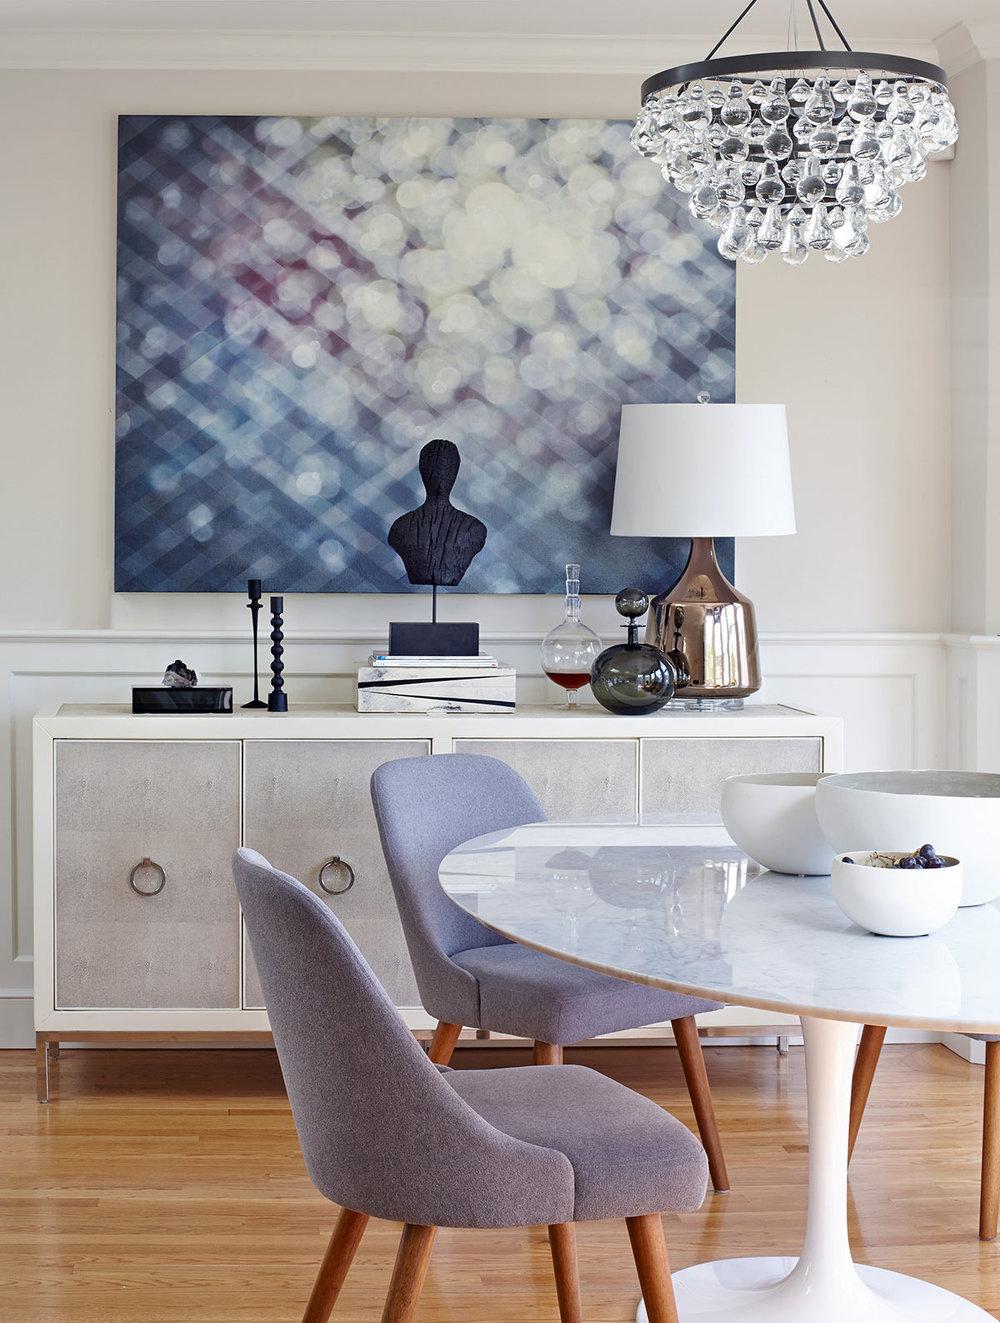 Interior_Design_Photography_Commercial_Portland_SanFransisco_George_Barberis_0000.jpg